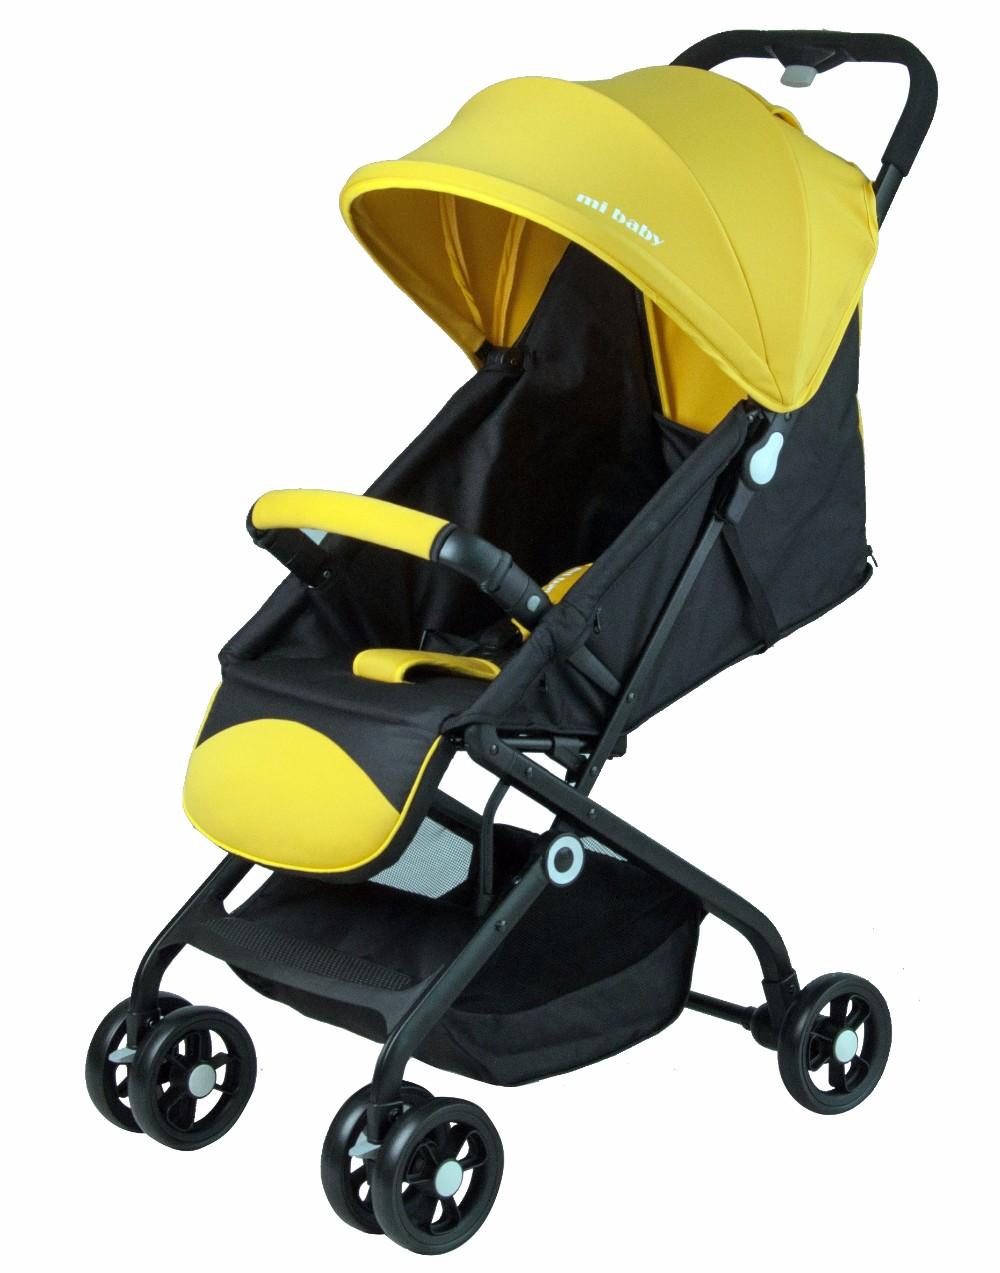 Stroller baby luxury most popular best seller color Motorized baby stroller